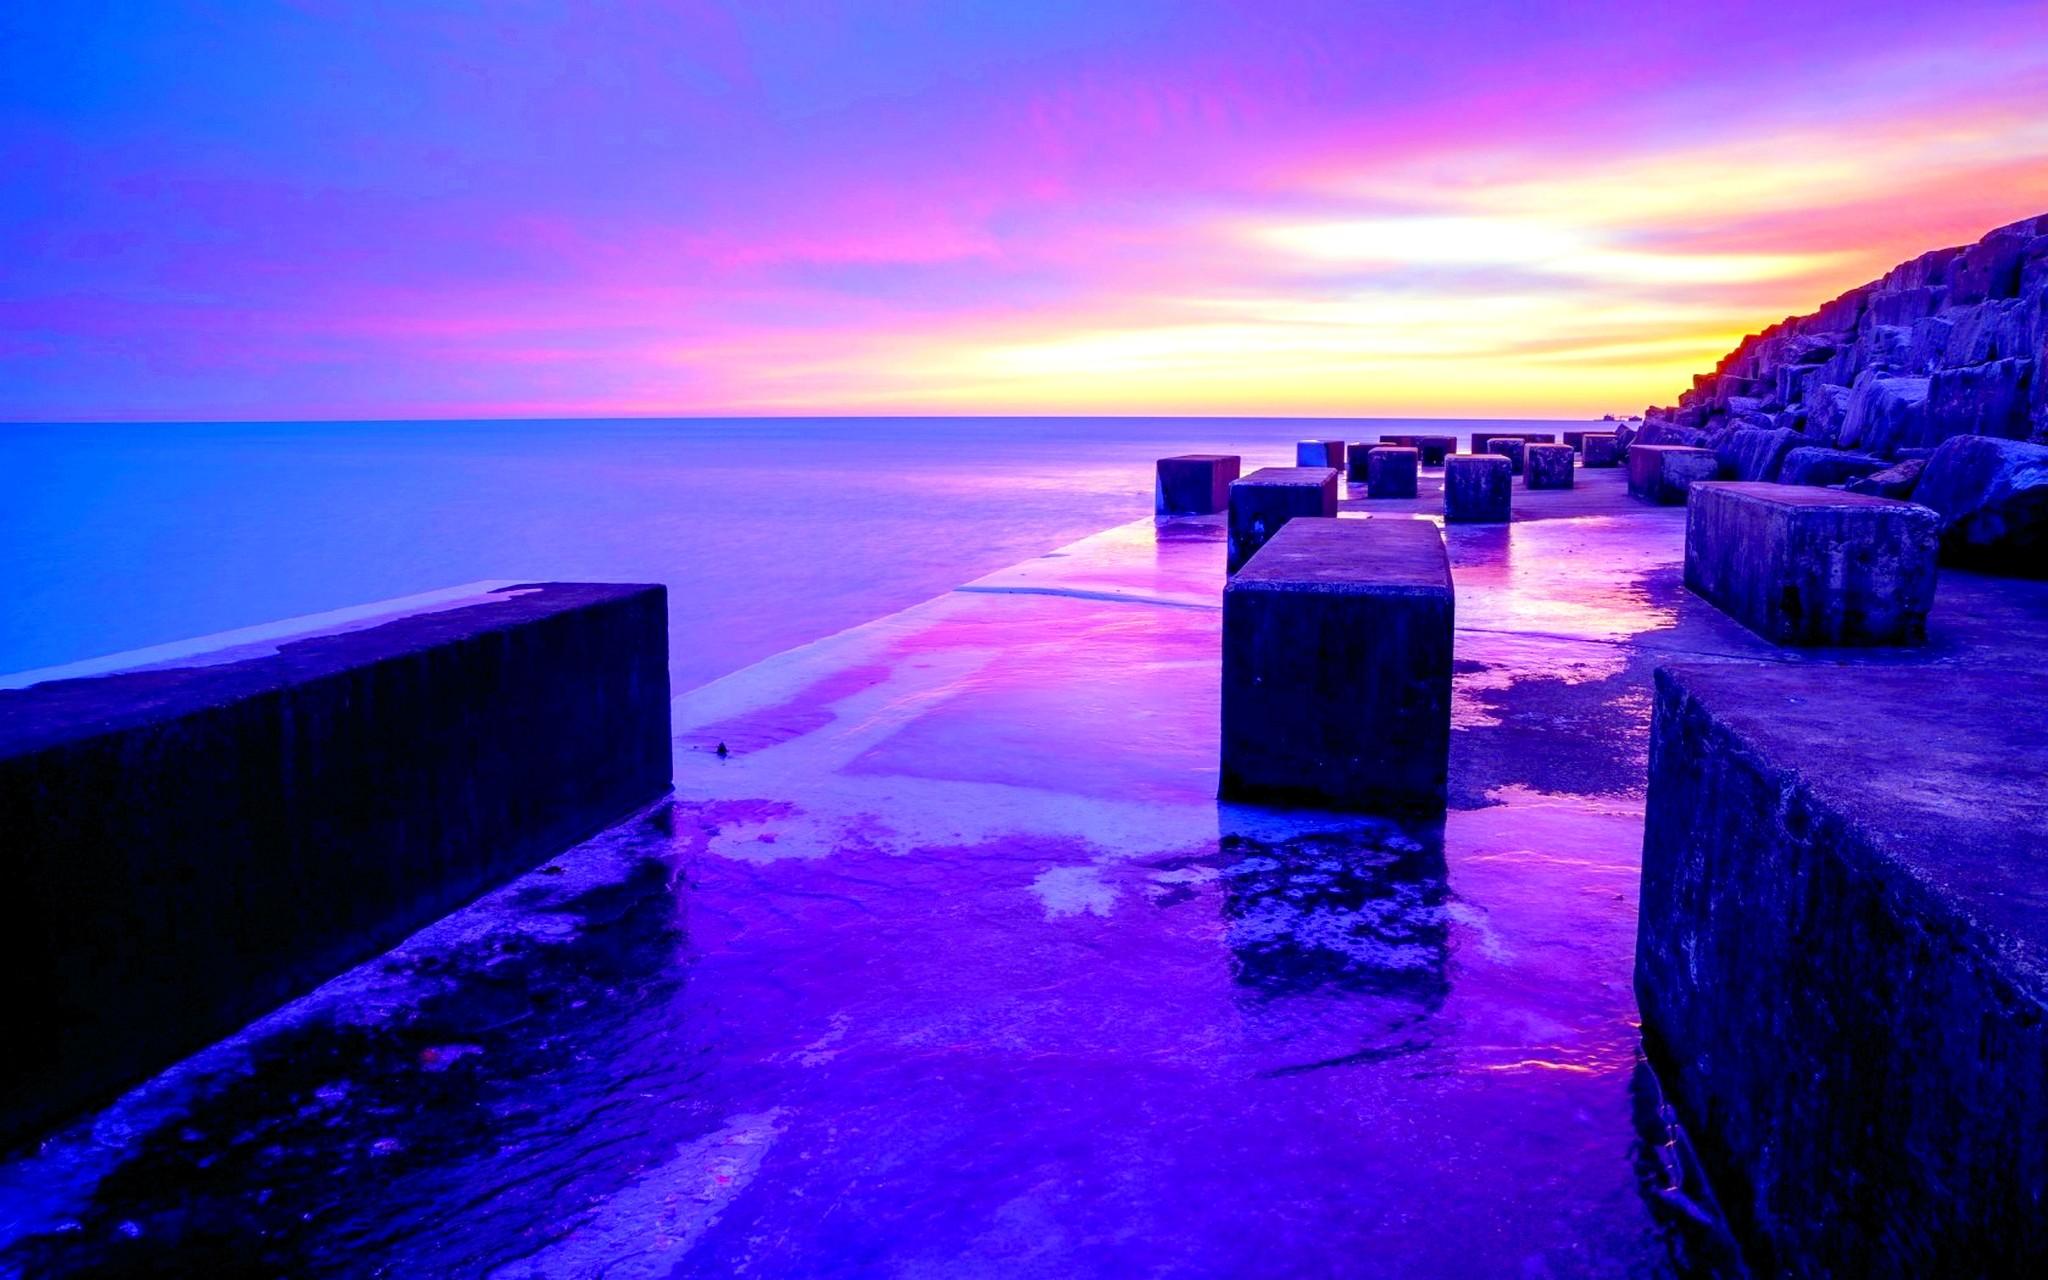 Purple Sunset Wallpaper #6897862